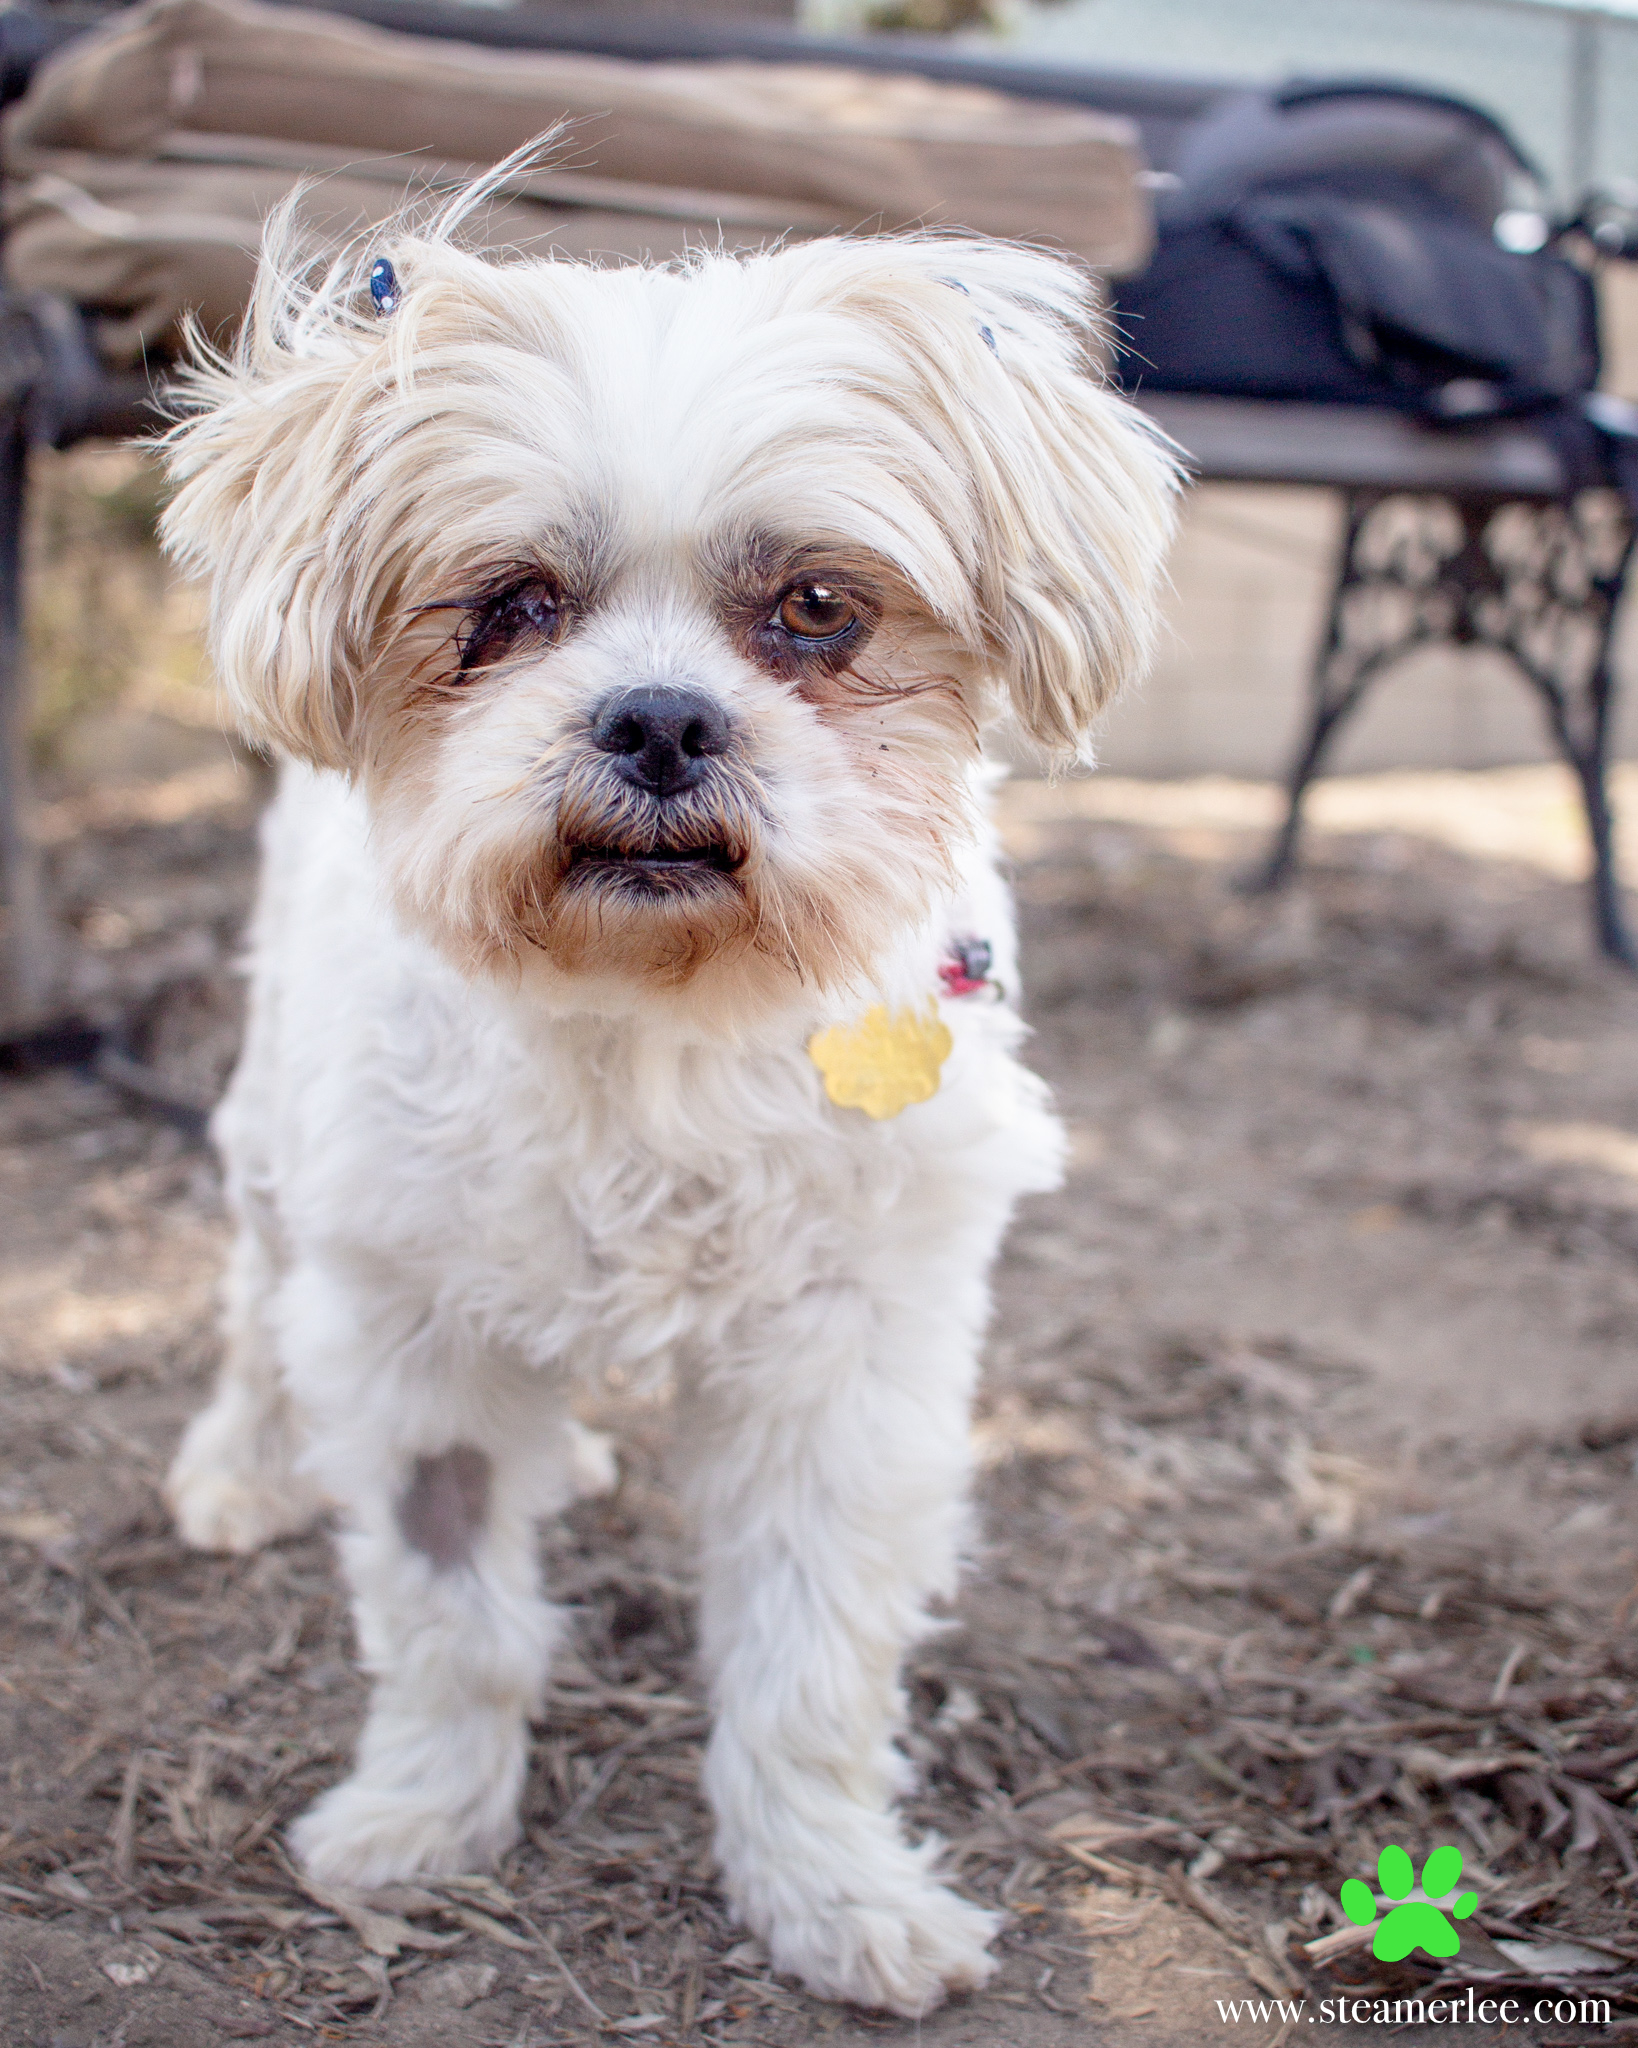 338-Orange-County-Dog-Photography-Steamer-Lee-Southern-California-SBACC.JPG